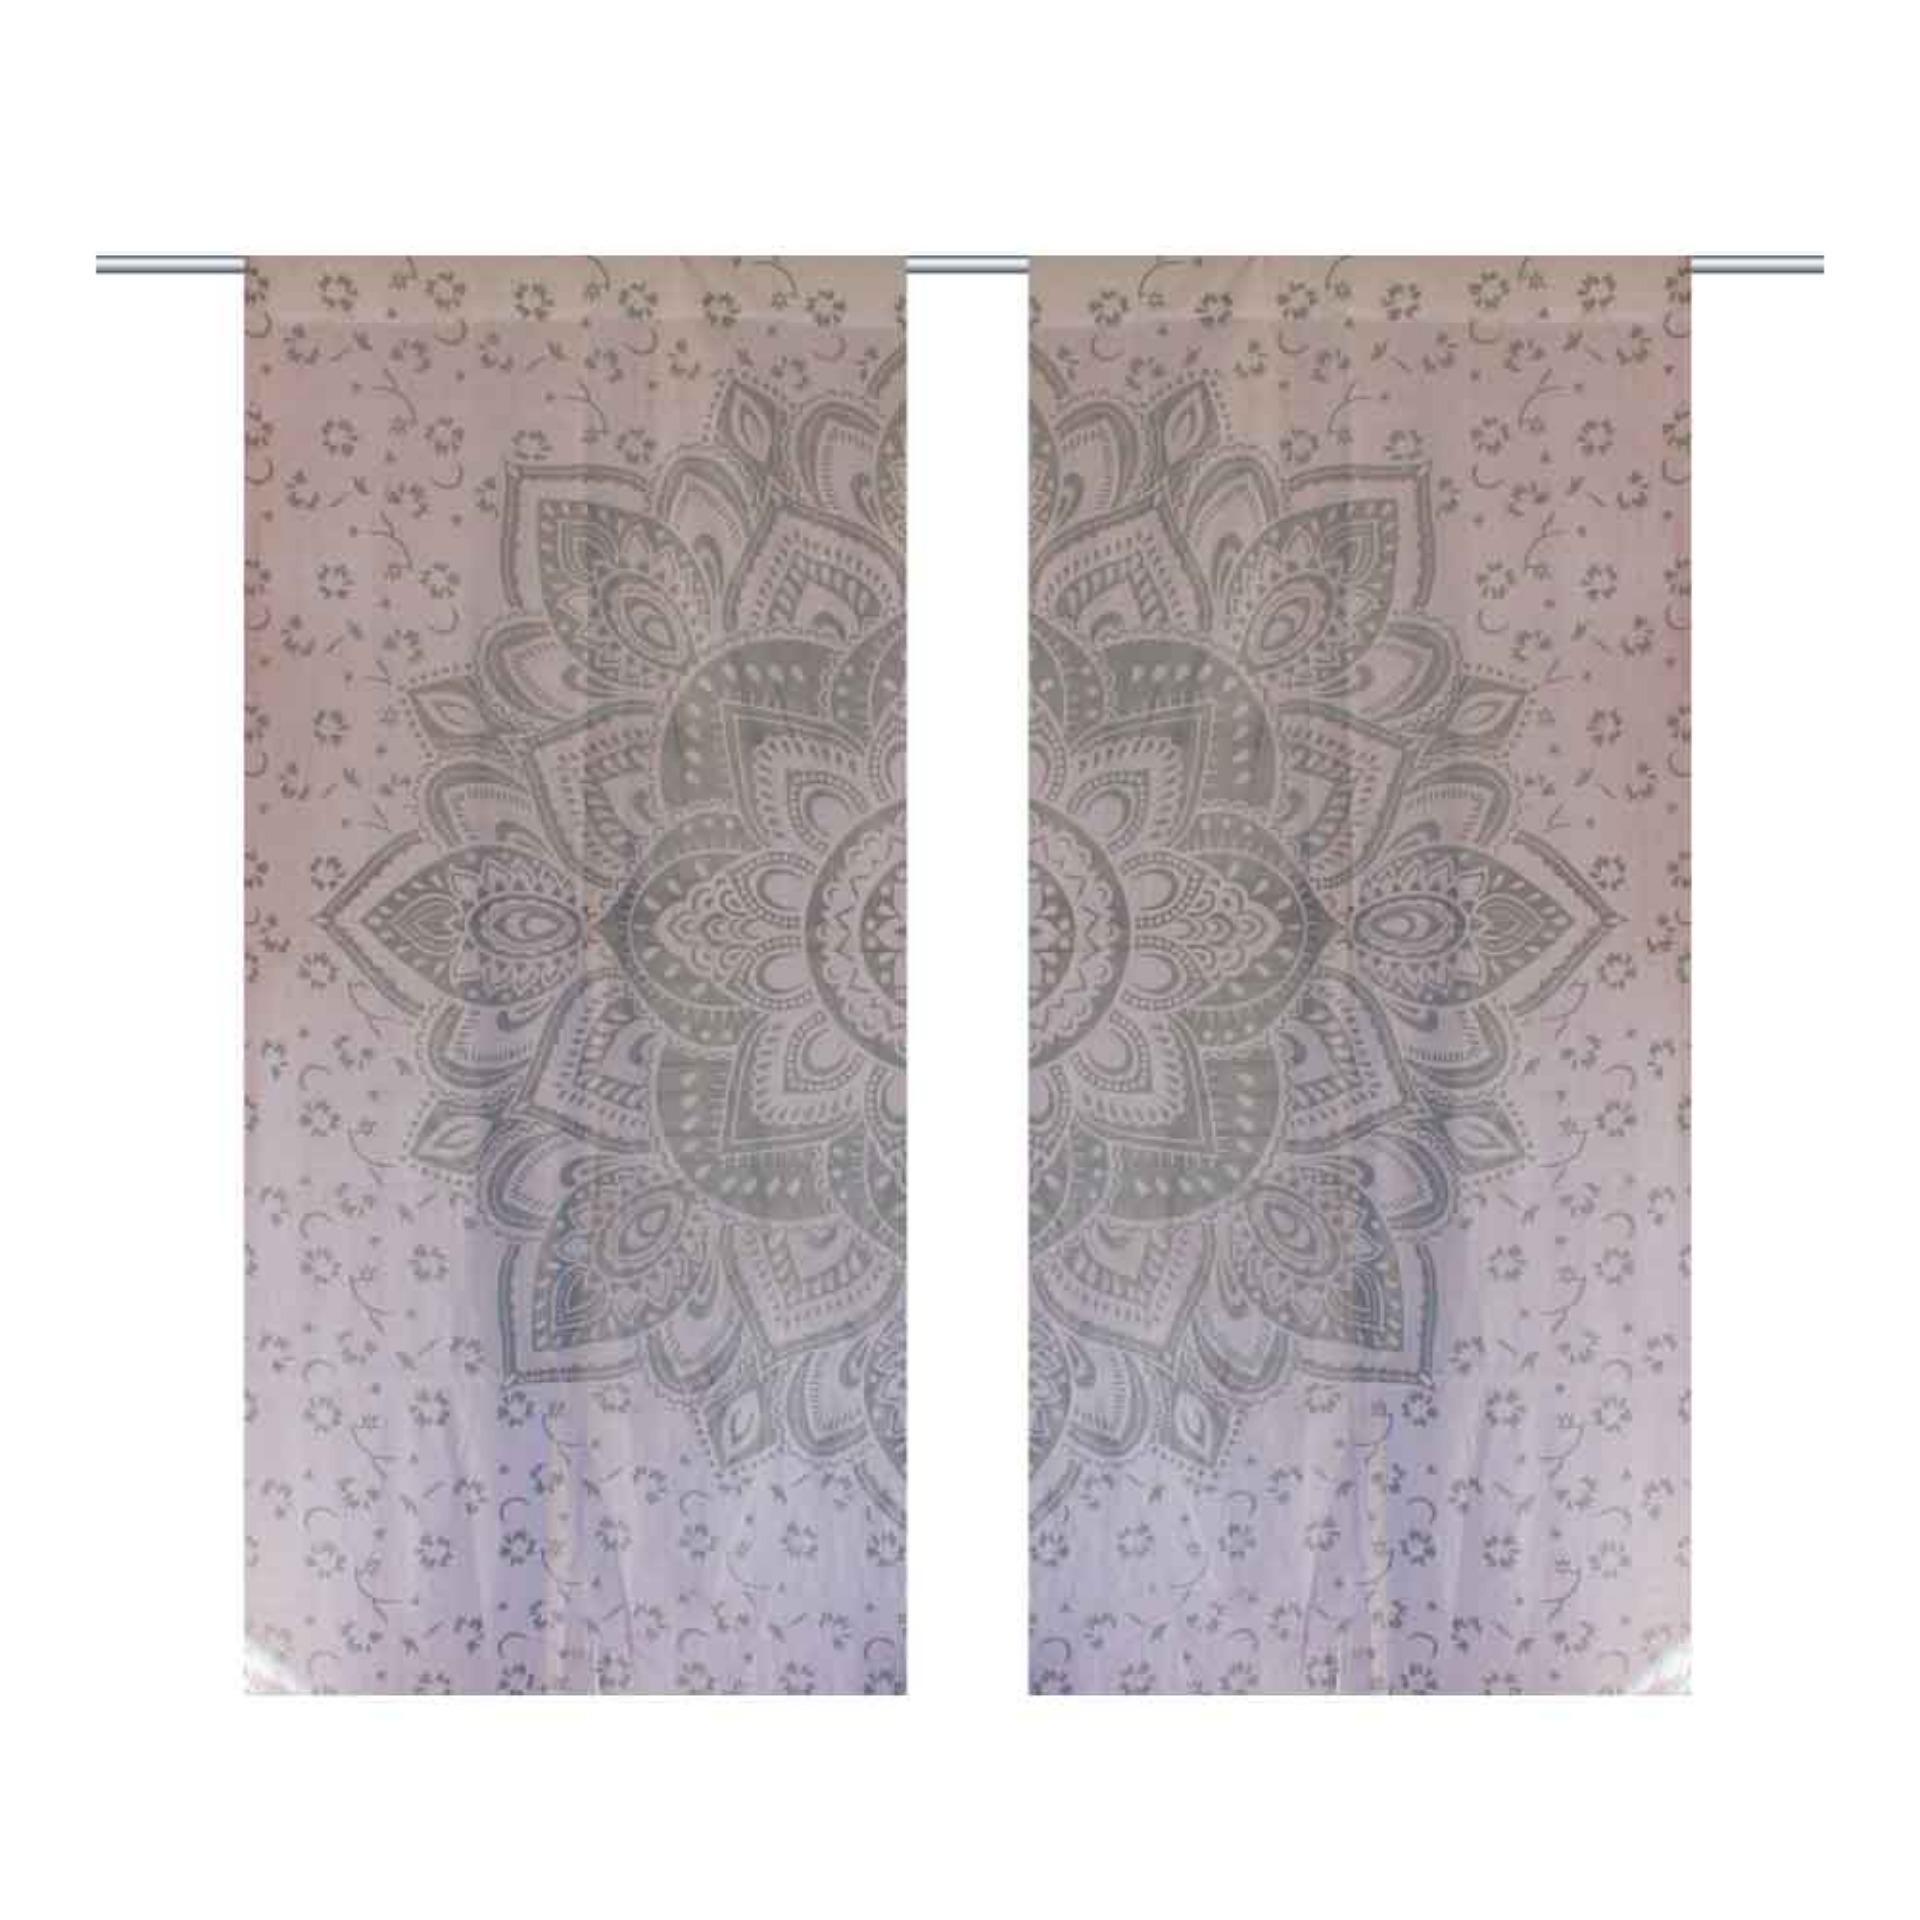 Murah 150cmx130cm Boho Wall Carpet Tapestry Mandala Tapestry Crystal ... - Murah Sandal Indian